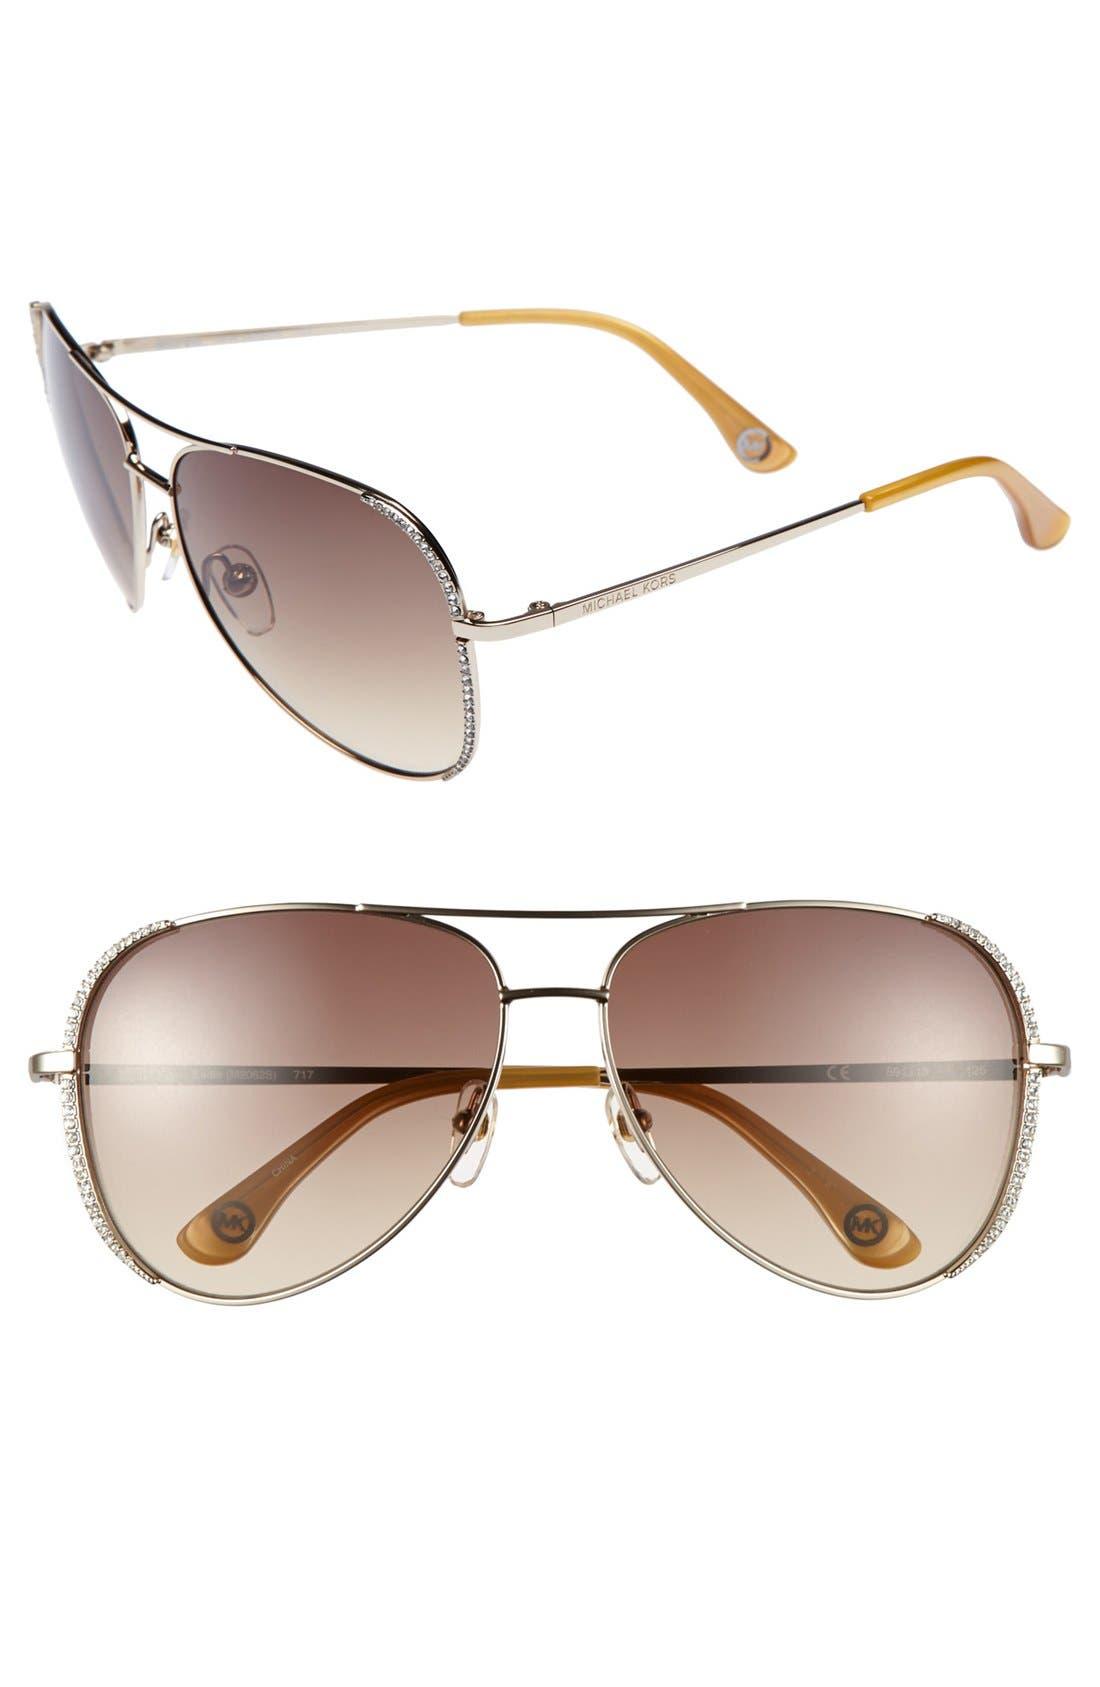 Main Image - Gucci 56mm Oversized Sunglasses